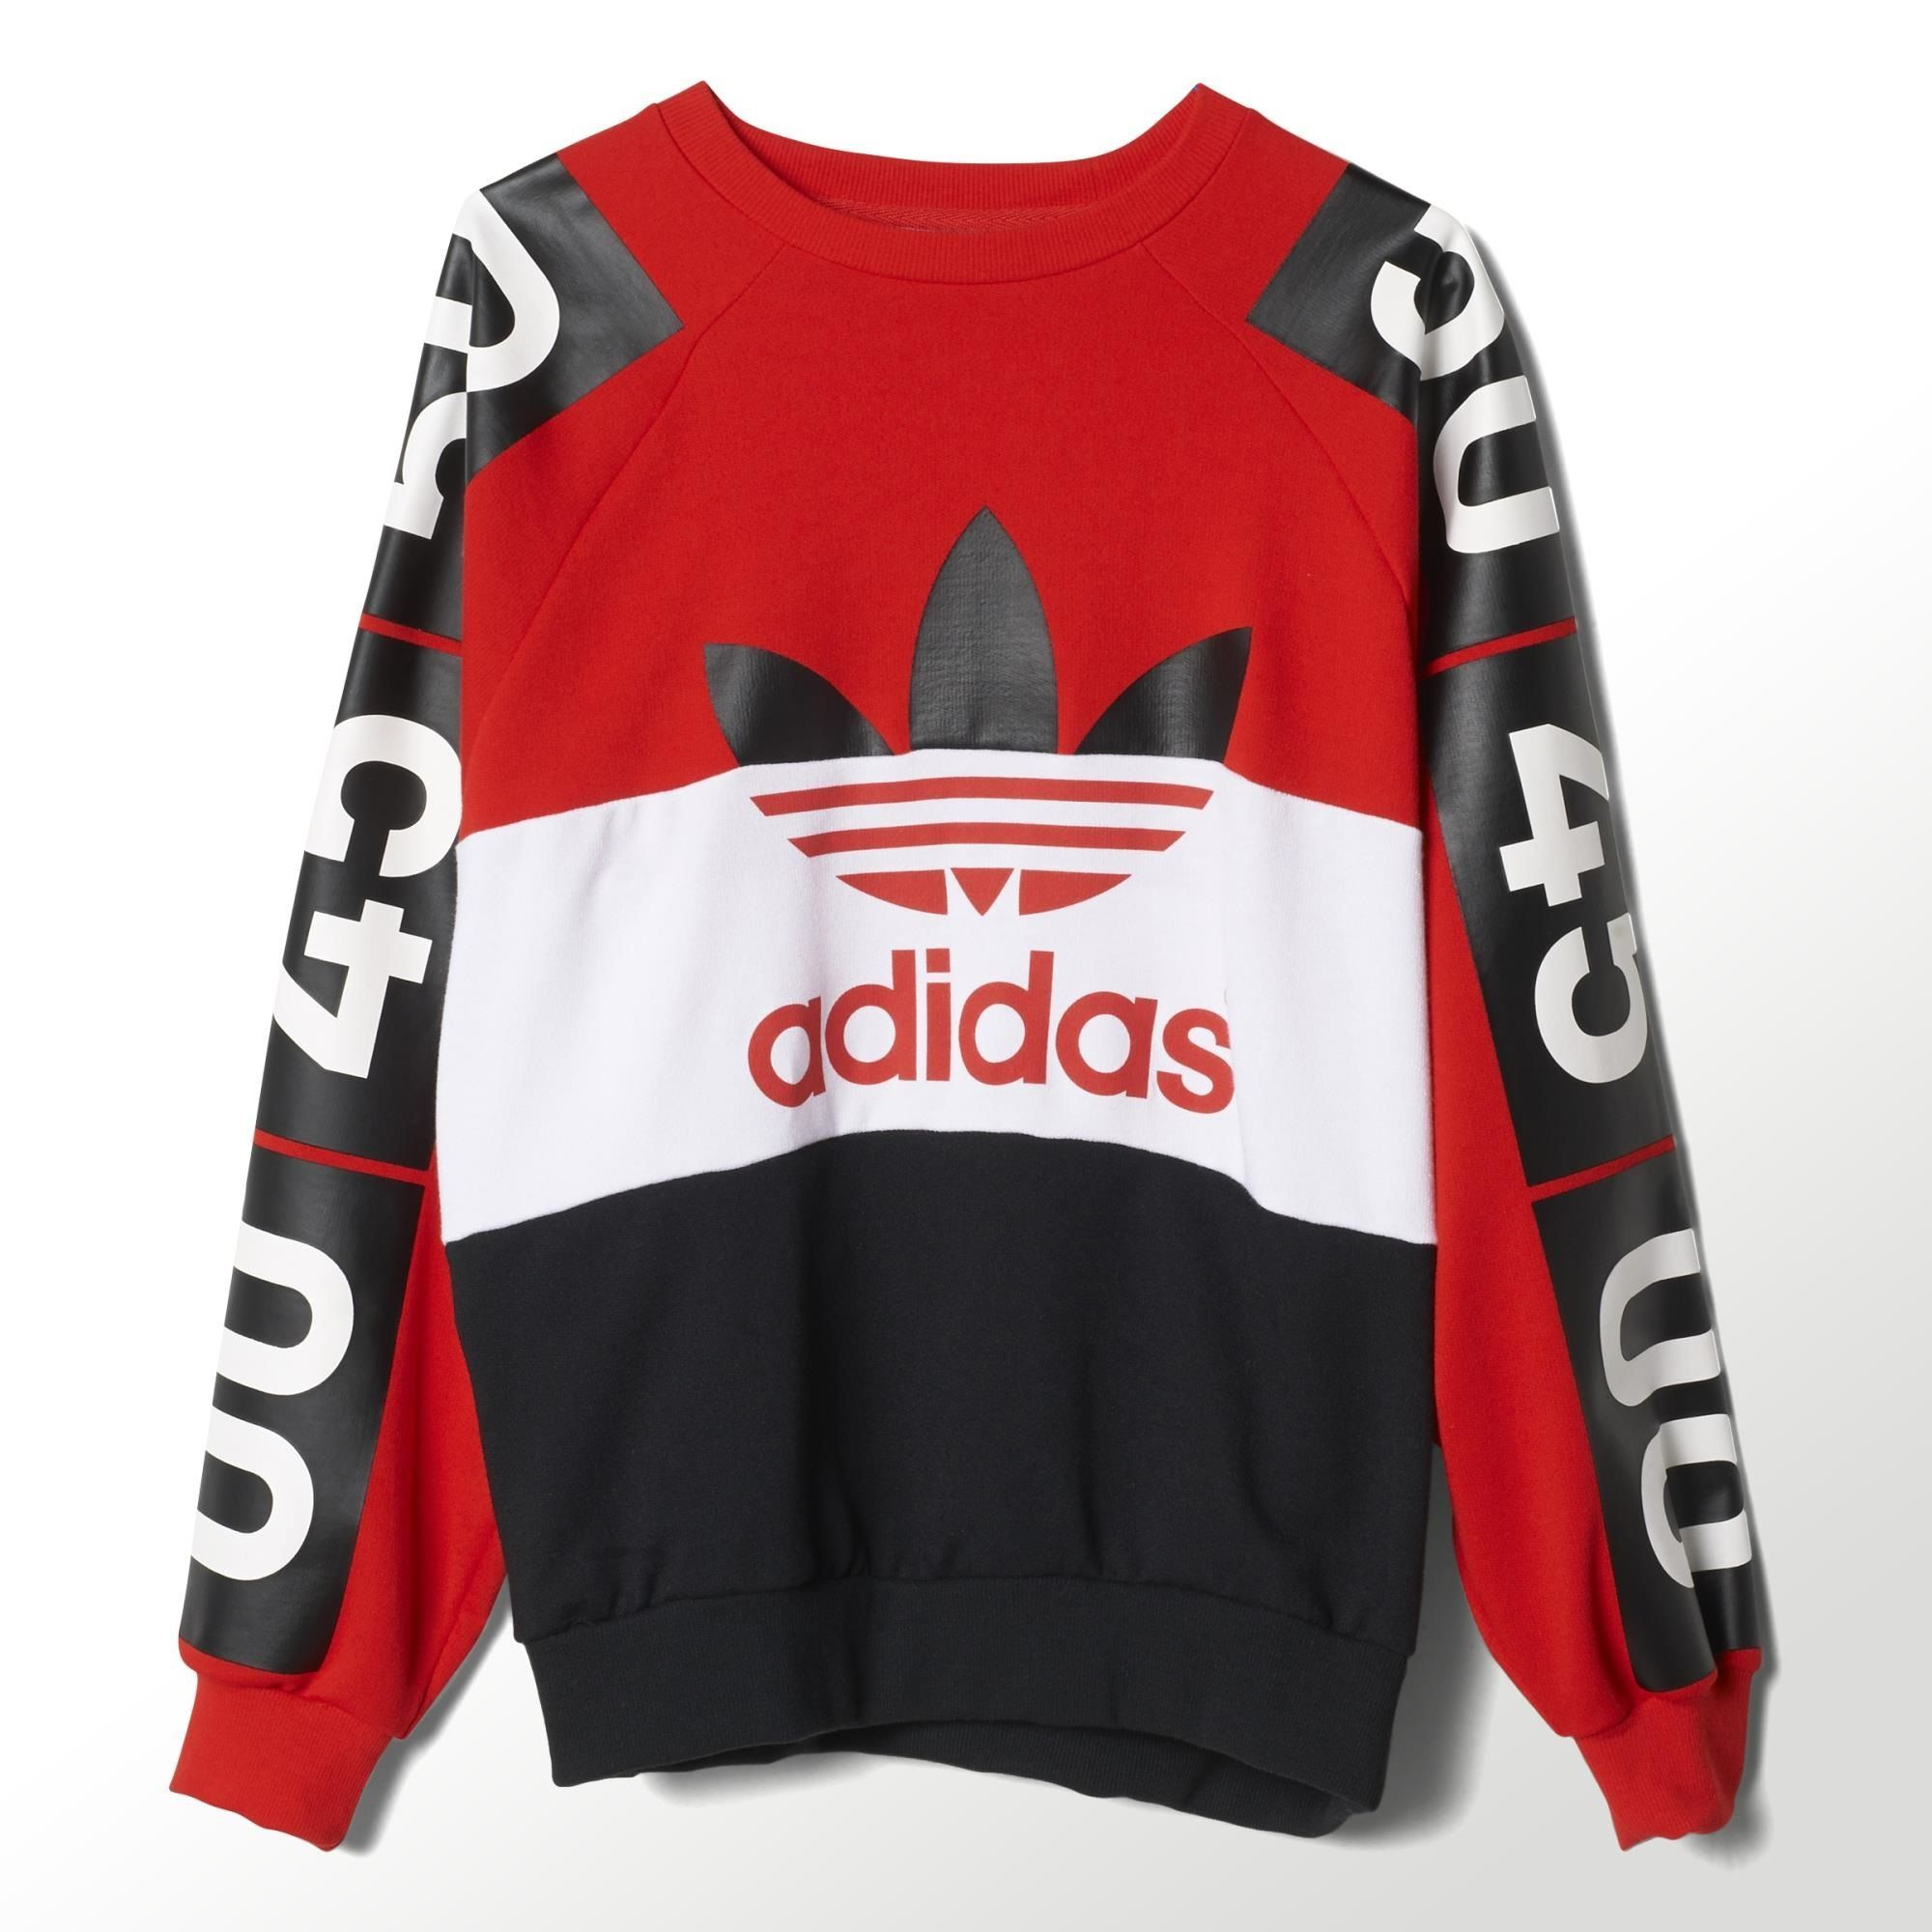 adidas Topshop Superstar Sweatshirt - Red | adidas US | Treats ...